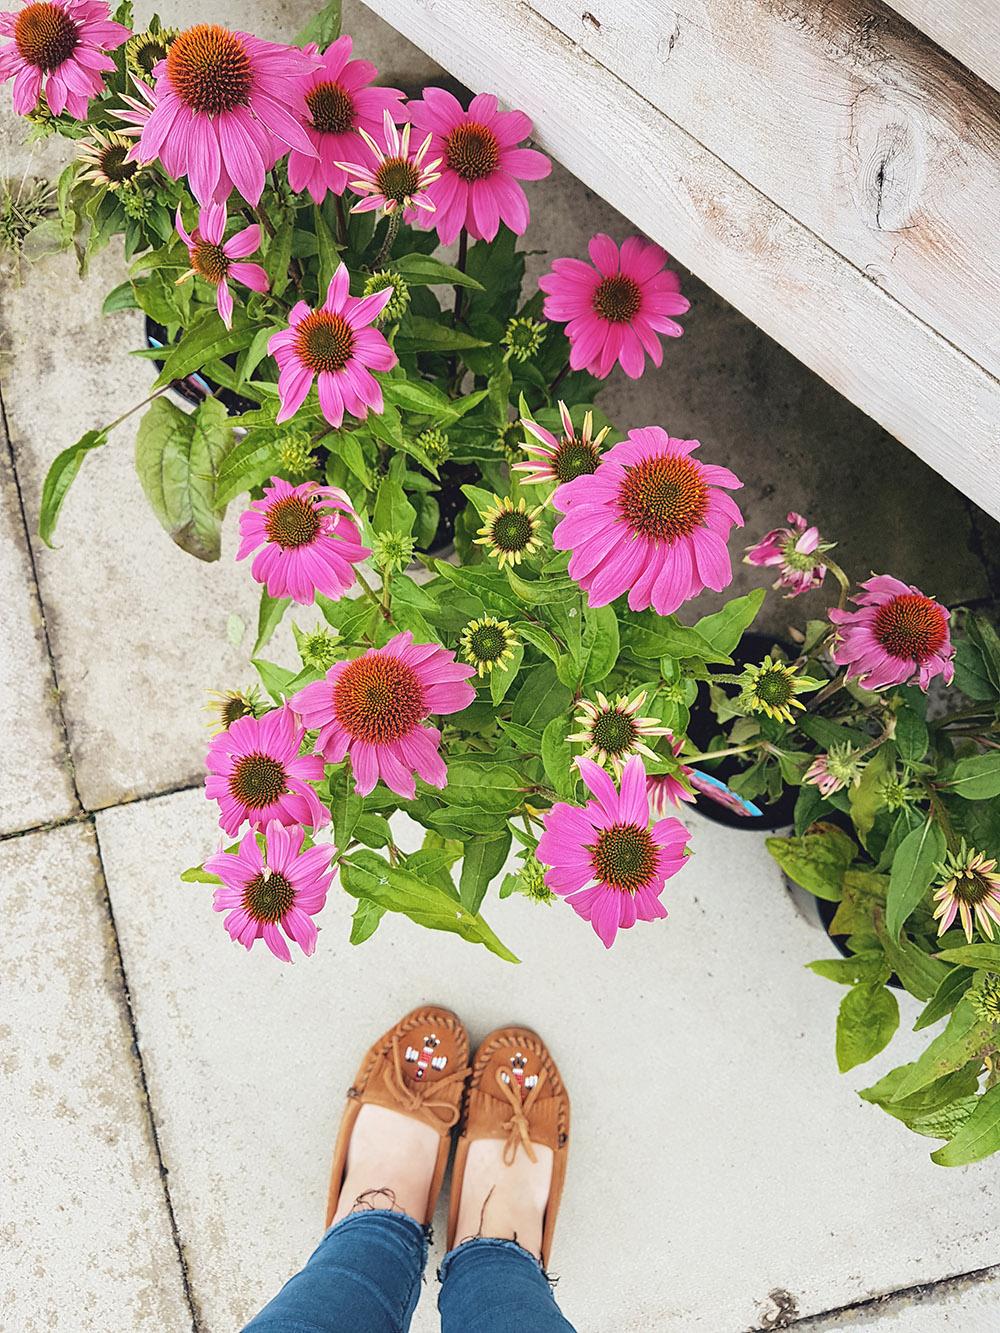 Summer Flowers - Echinacea